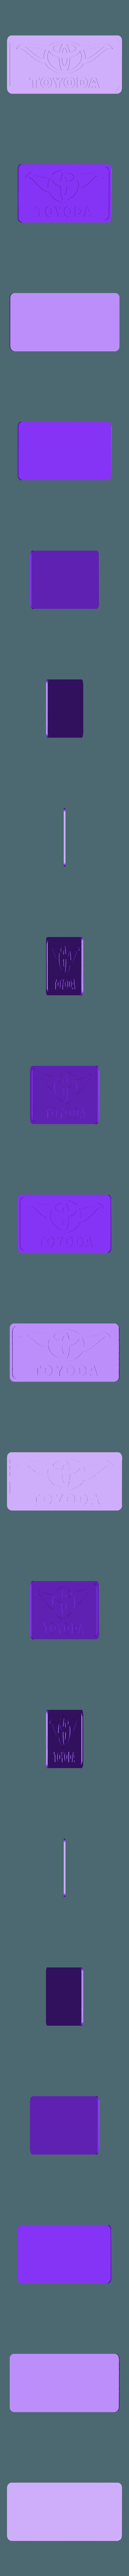 StarWars_-_YODA_-_Toyoda_v2.stl Télécharger fichier STL gratuit StarWars - YODA - Toyoda • Objet imprimable en 3D, yb__magiic